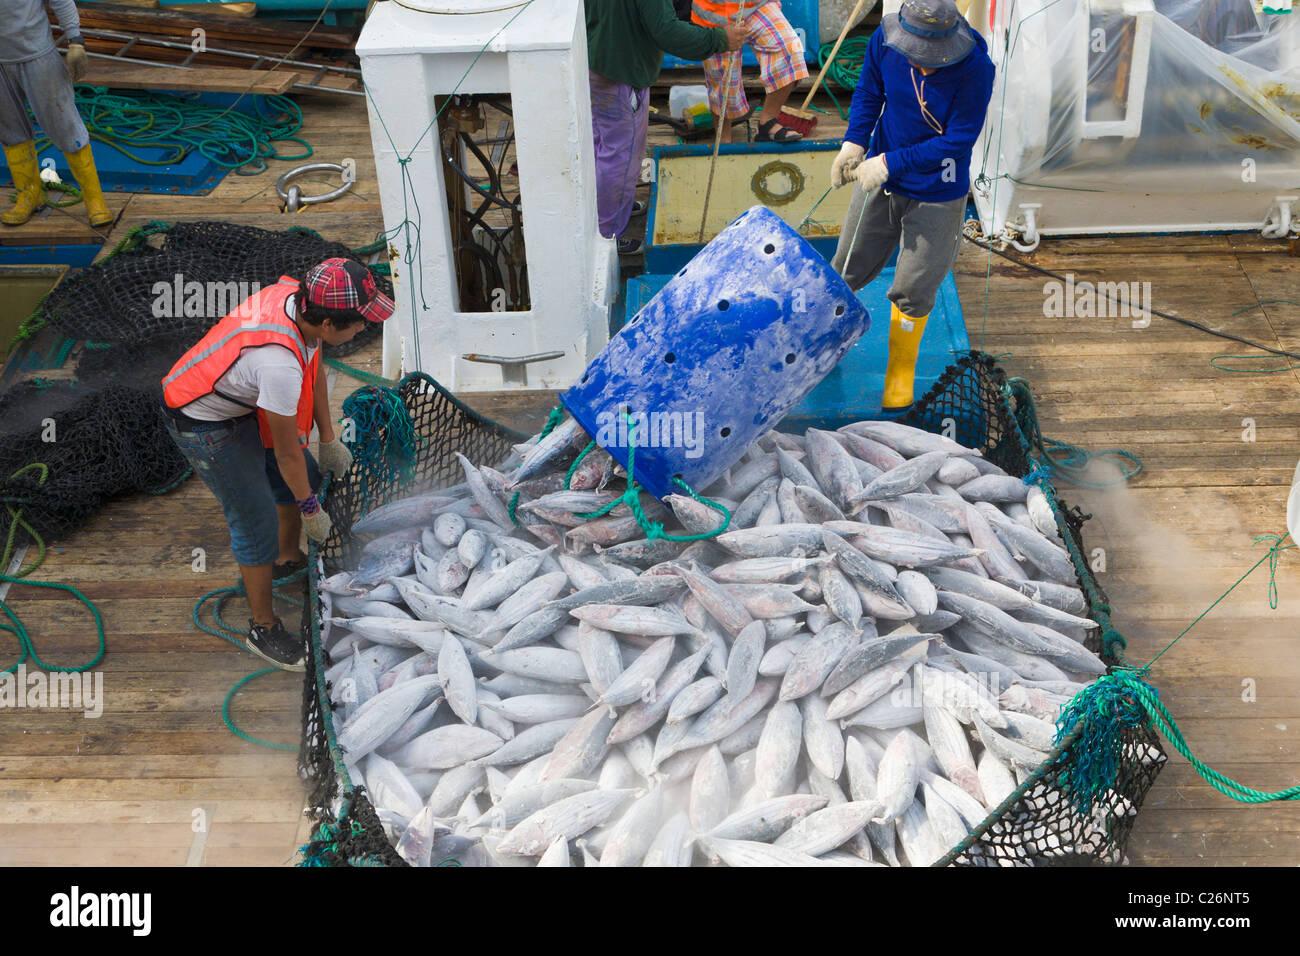 Tuna being unloaded from fishing boat, Manta, Ecuador Stock Photo